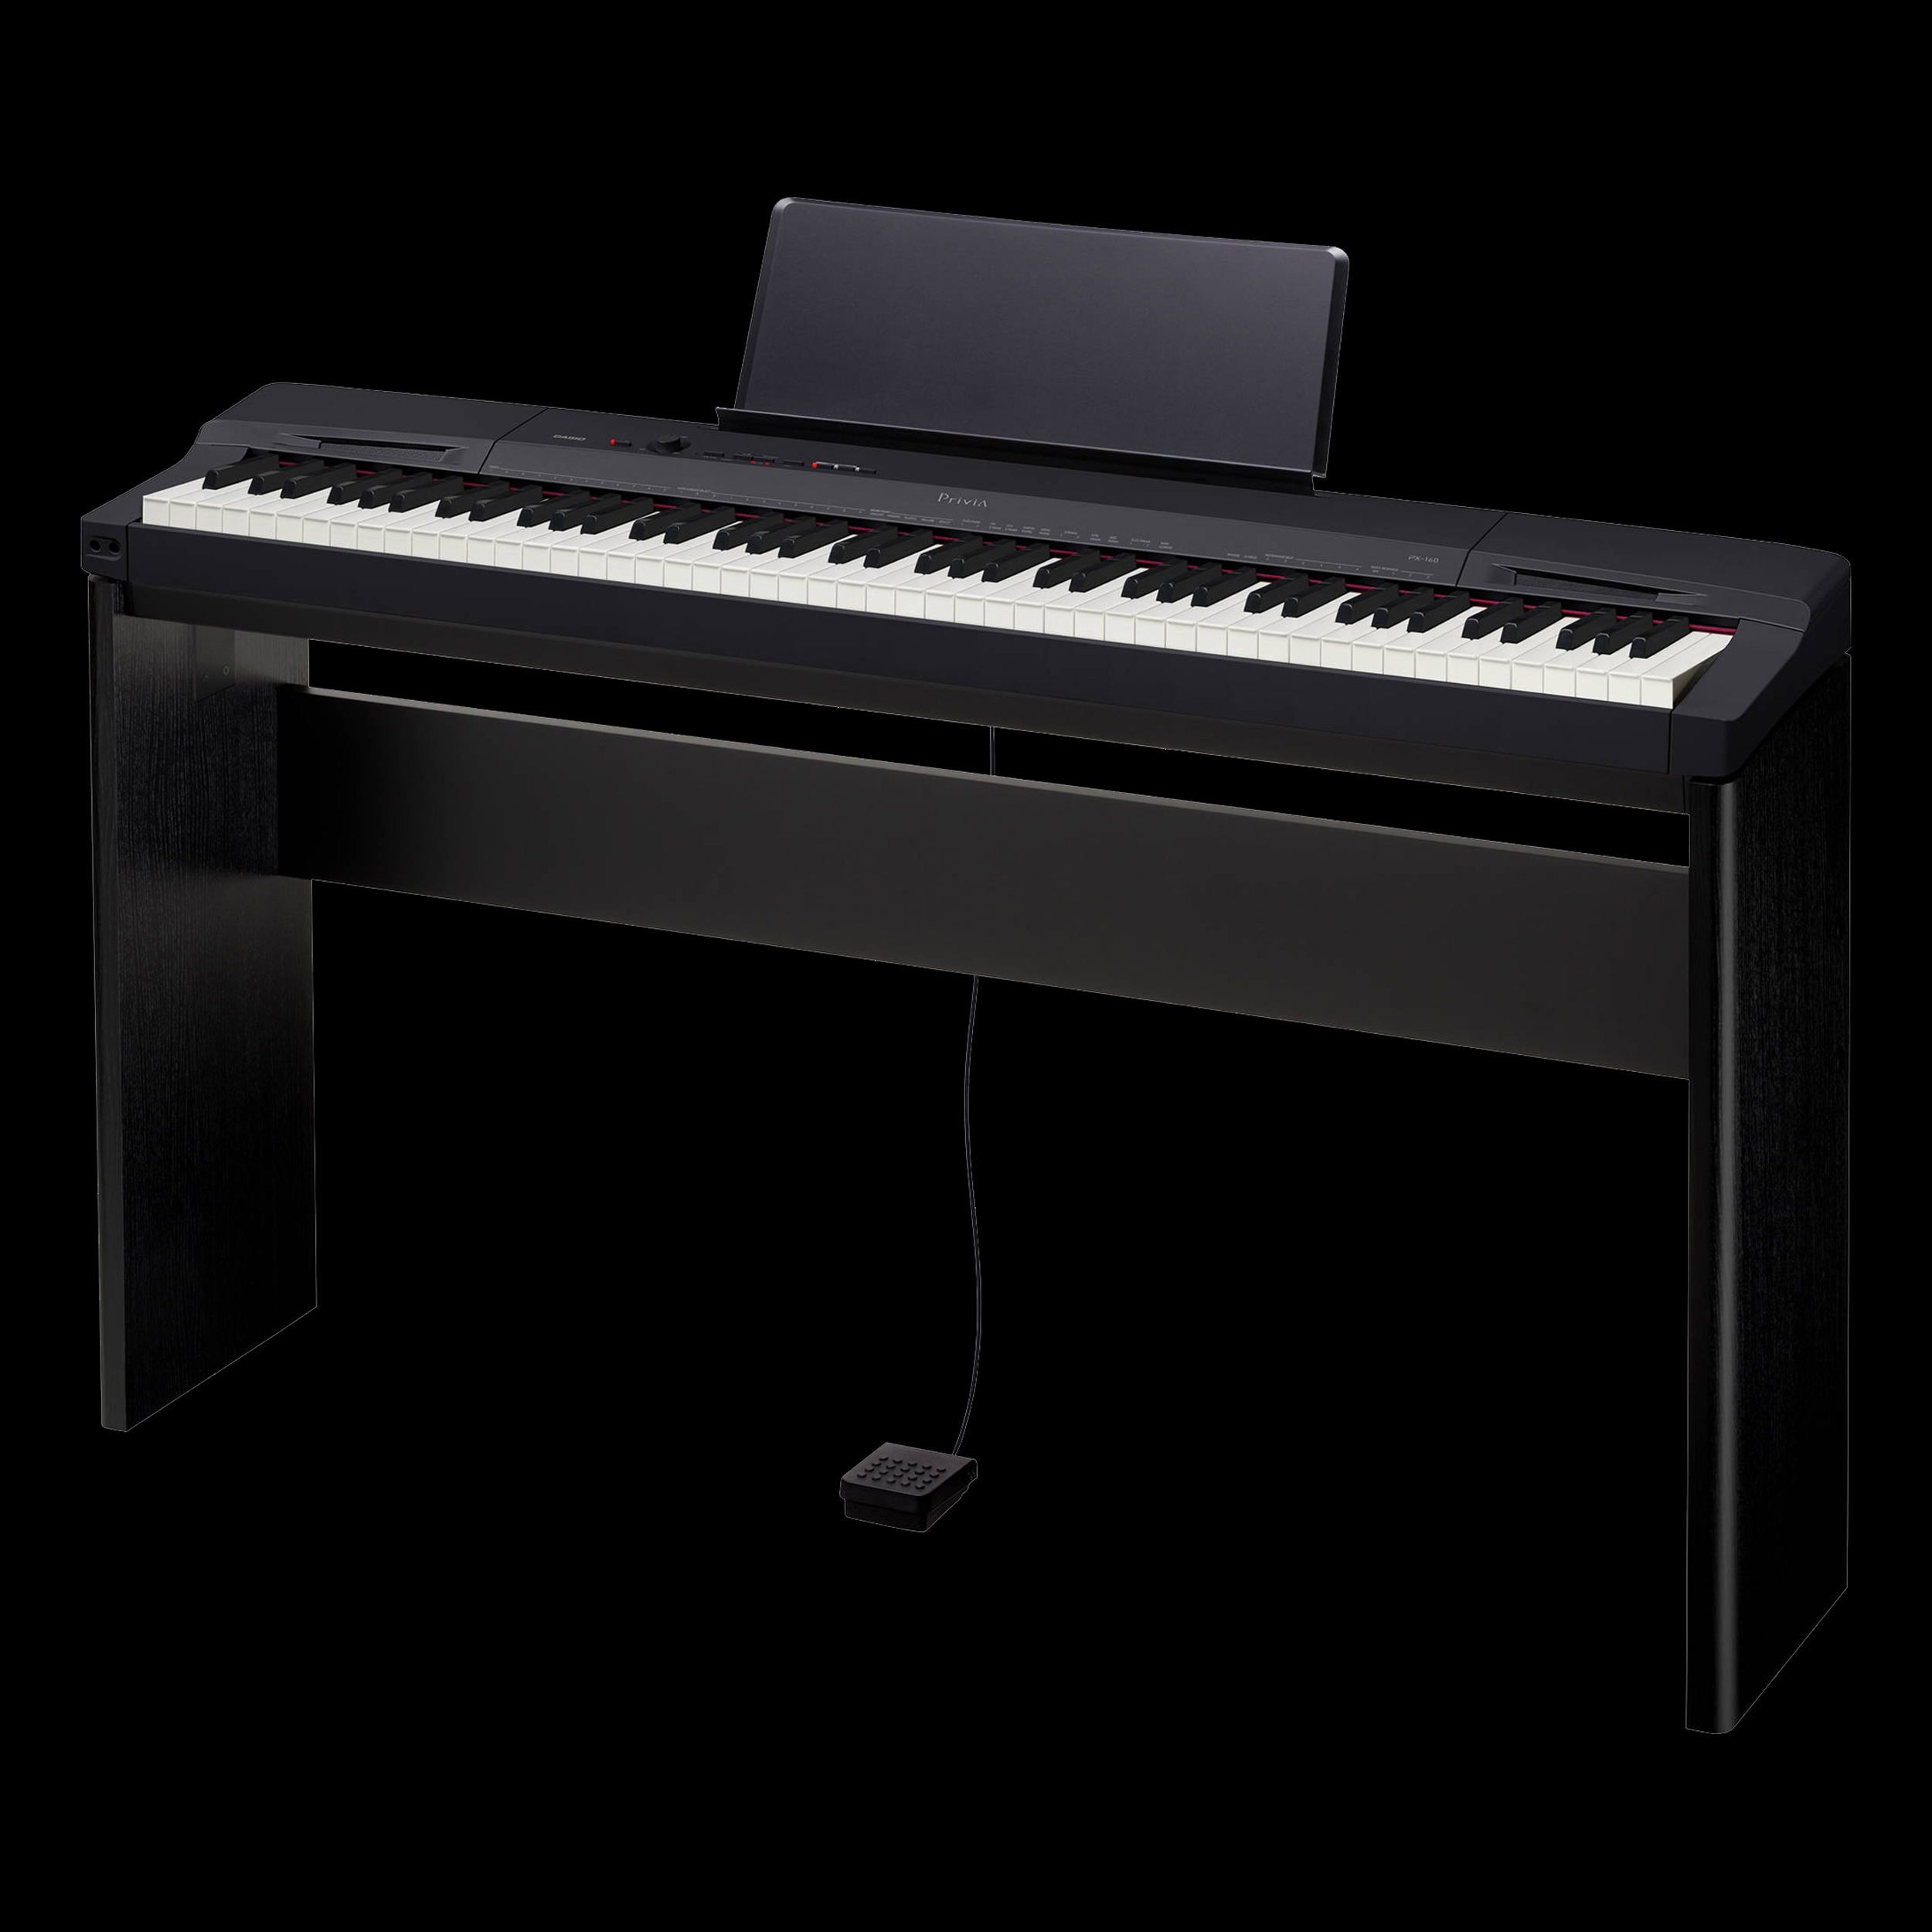 Piano Digital Casio Privia Px 160 : casio px 160 privia 88 key digital piano matching cs 67 keyboard stand black ebay ~ Hamham.info Haus und Dekorationen